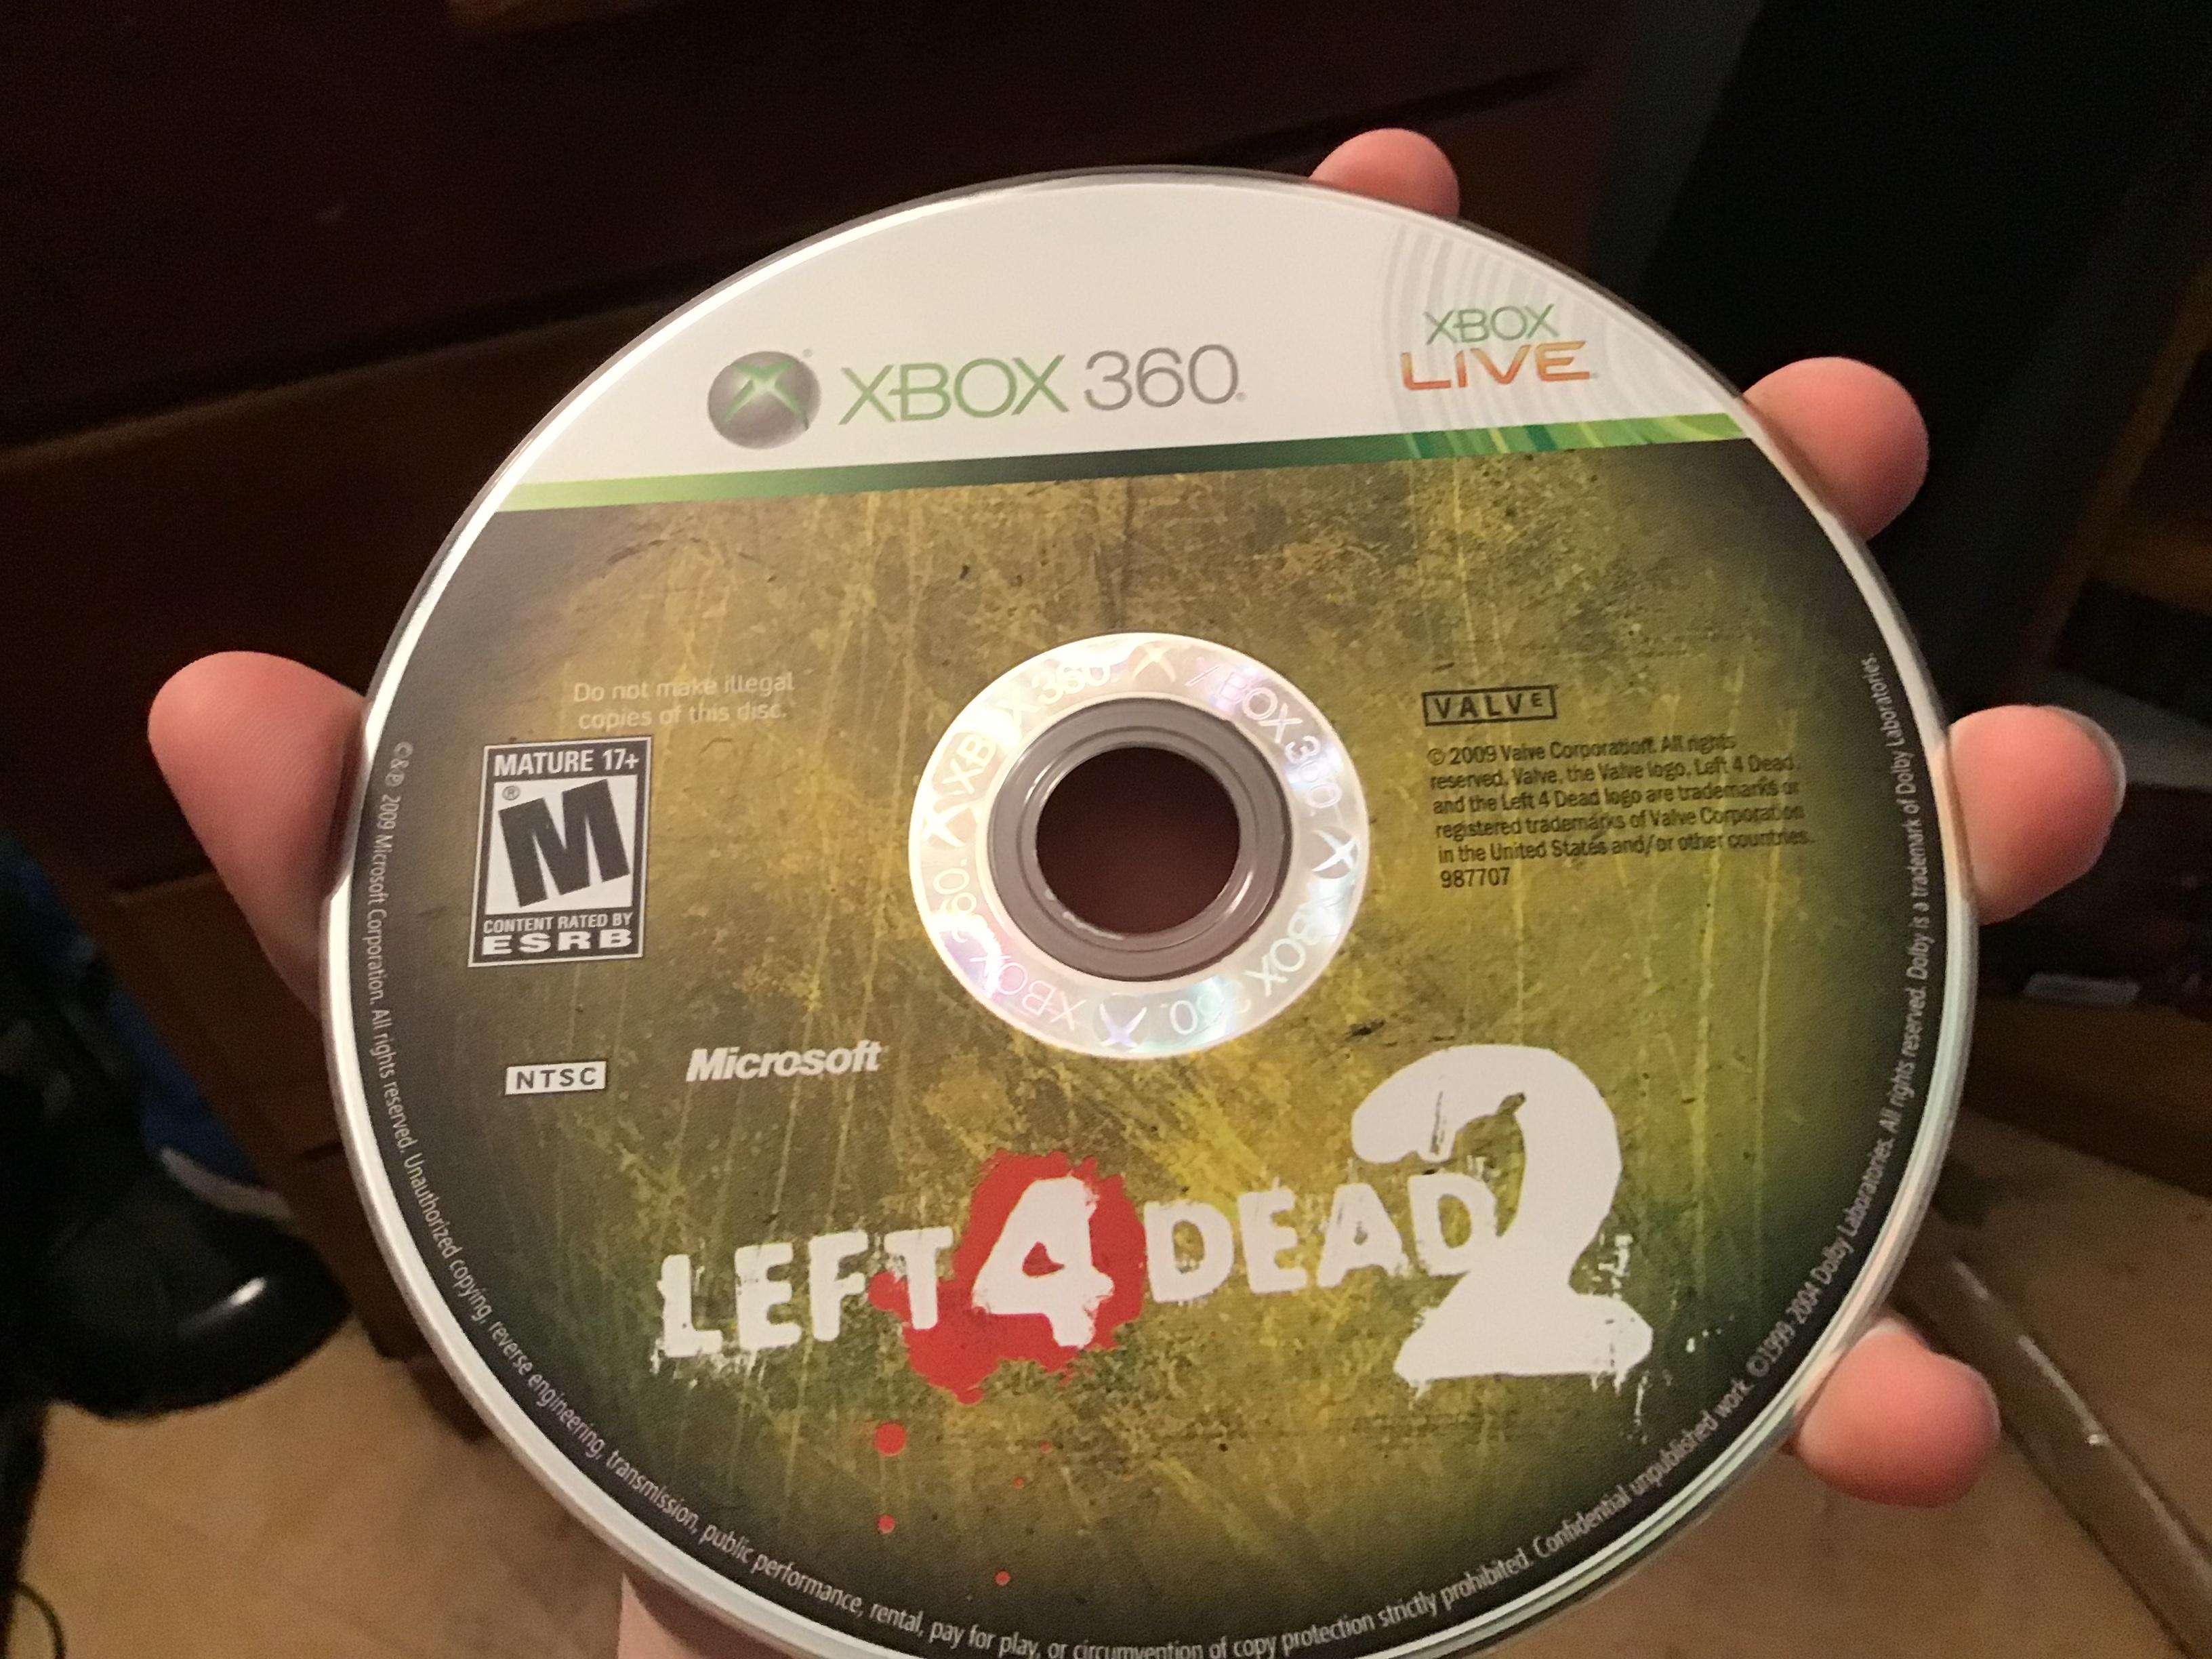 My L4D2 disc won't work, my Xbox doesn't load it [IMG]